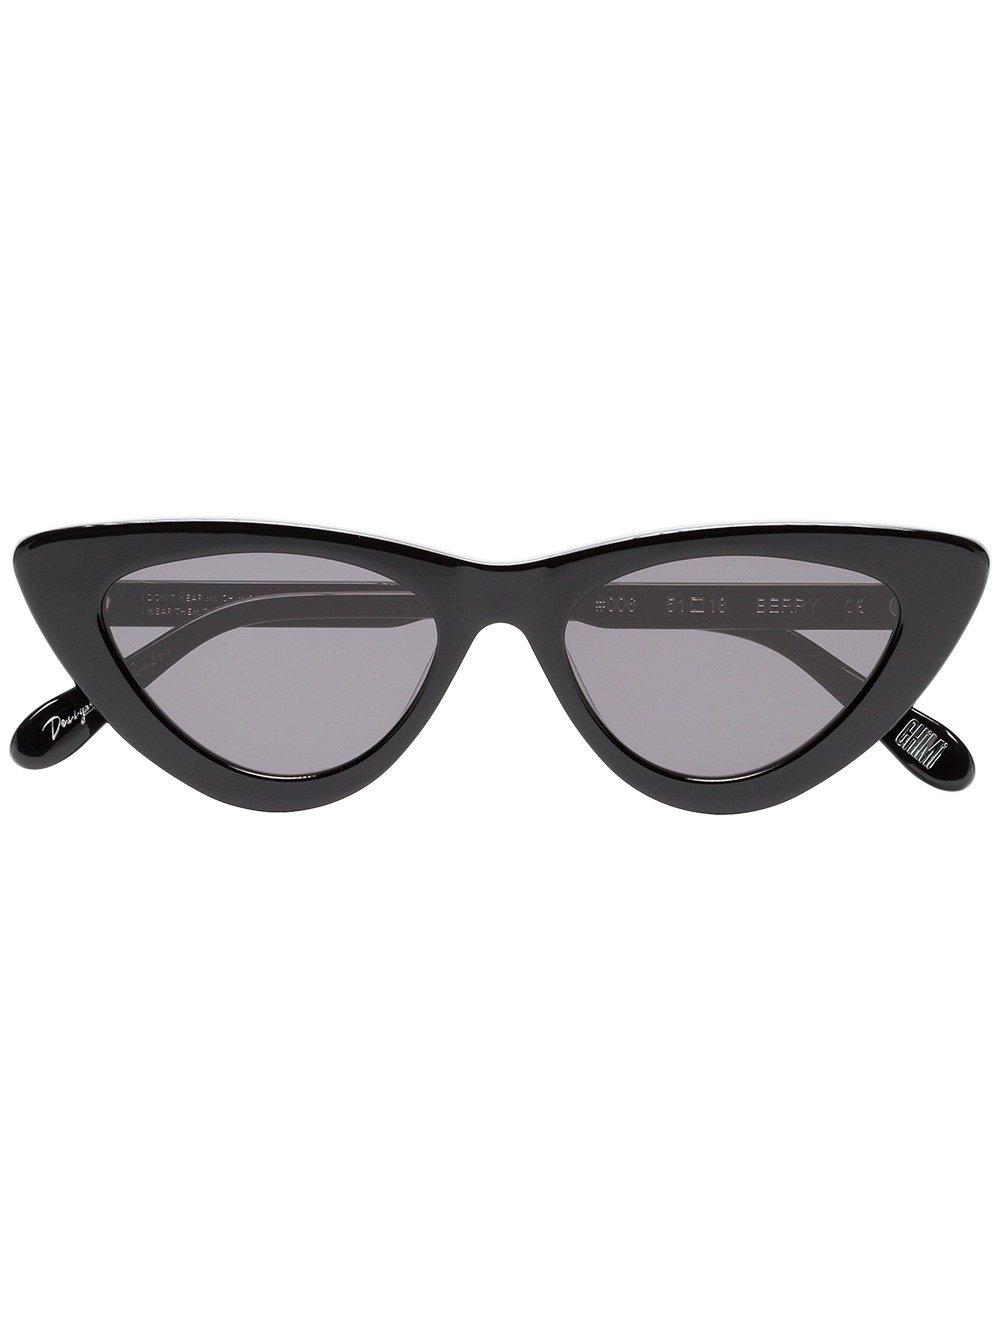 Chimi Black Berry cat-eye sunglasses